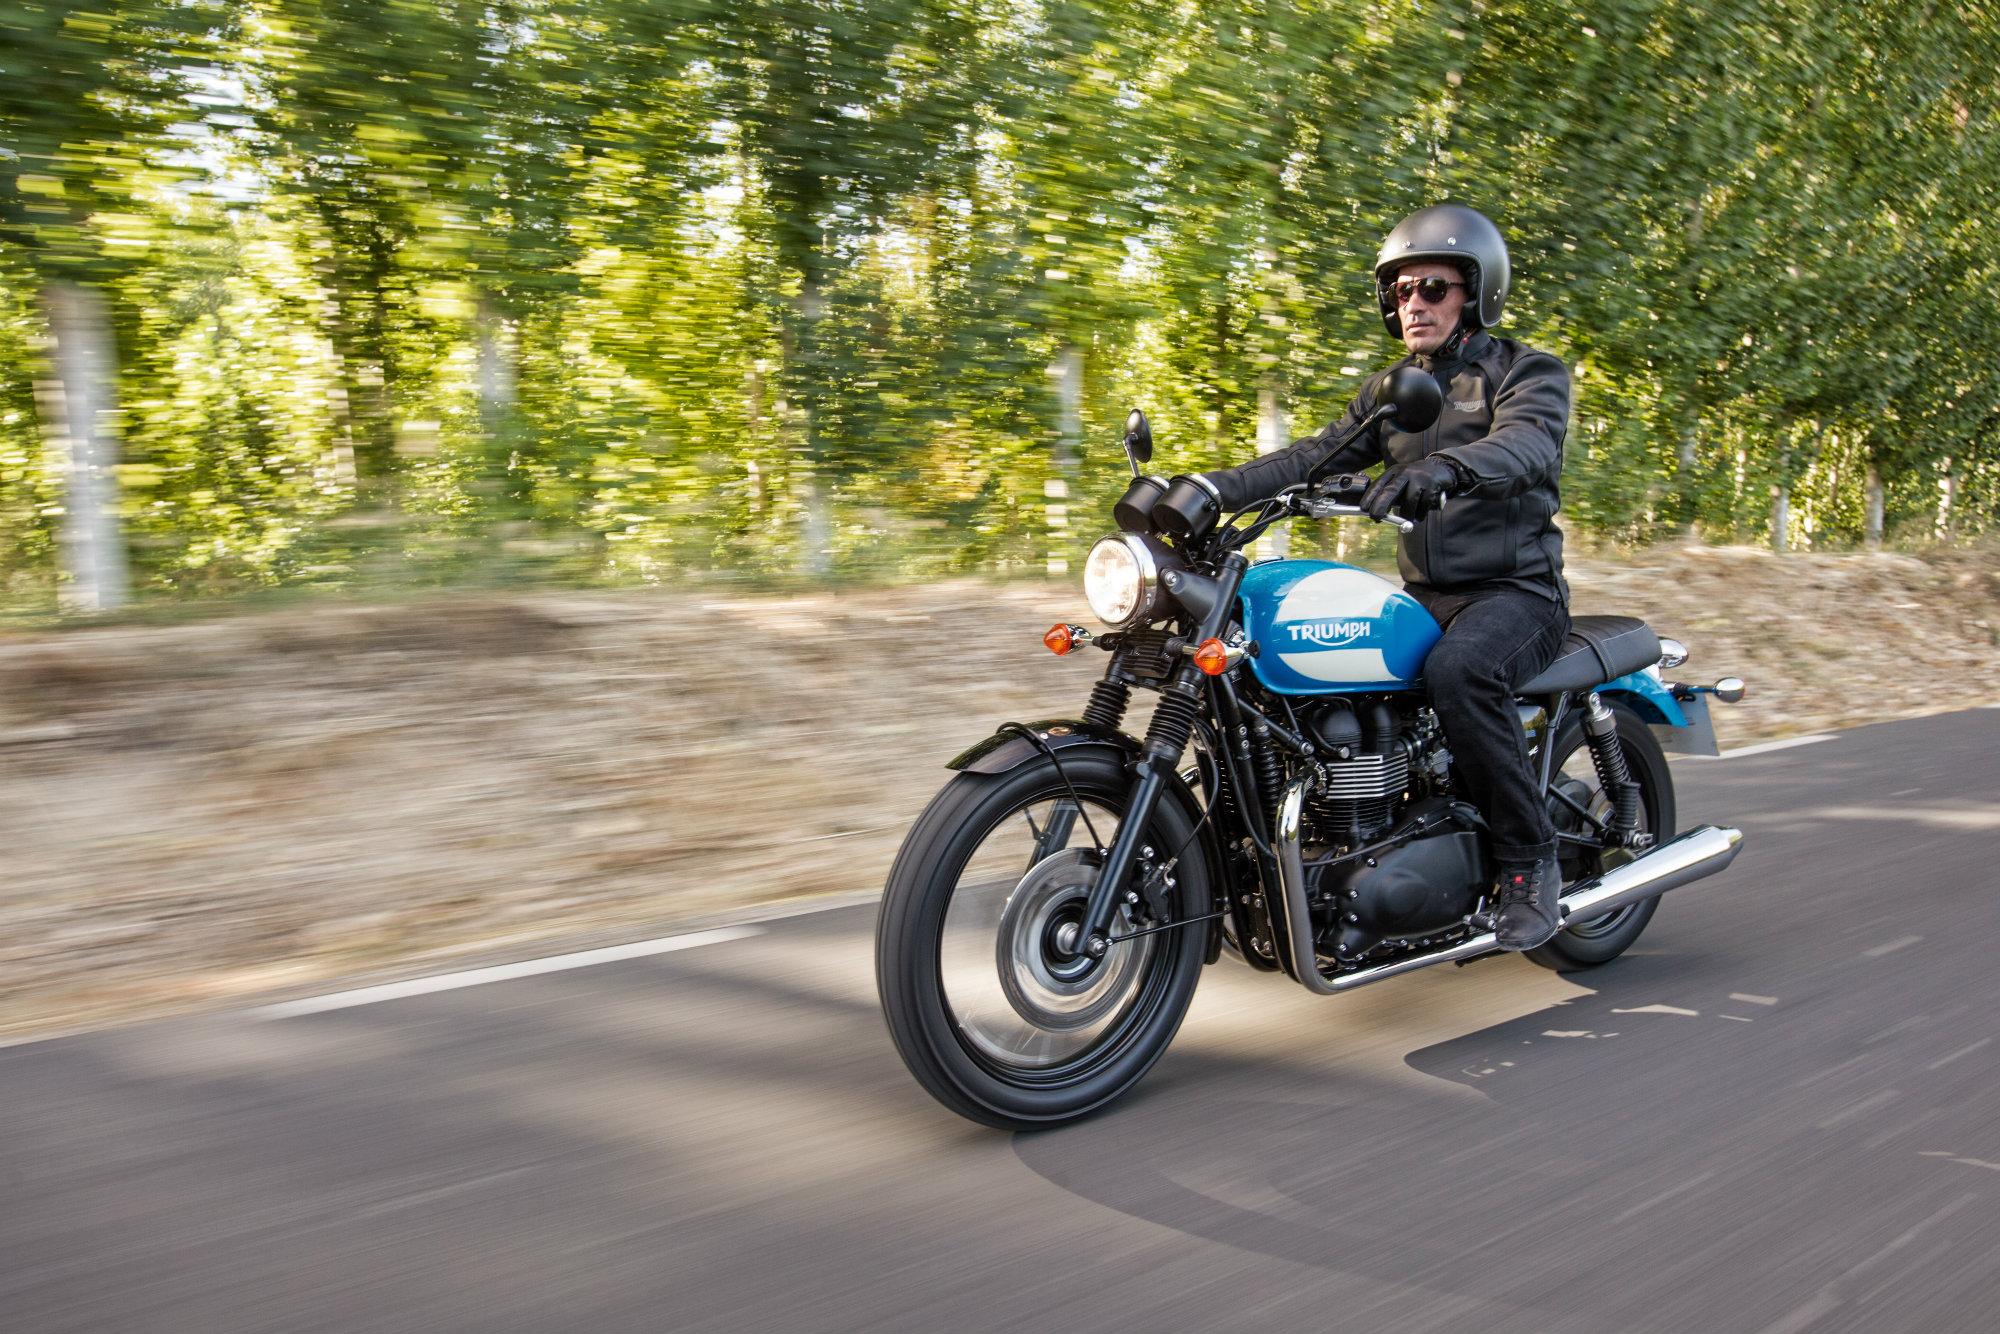 Intermot 2014: Three new Triumph Bonnevilles